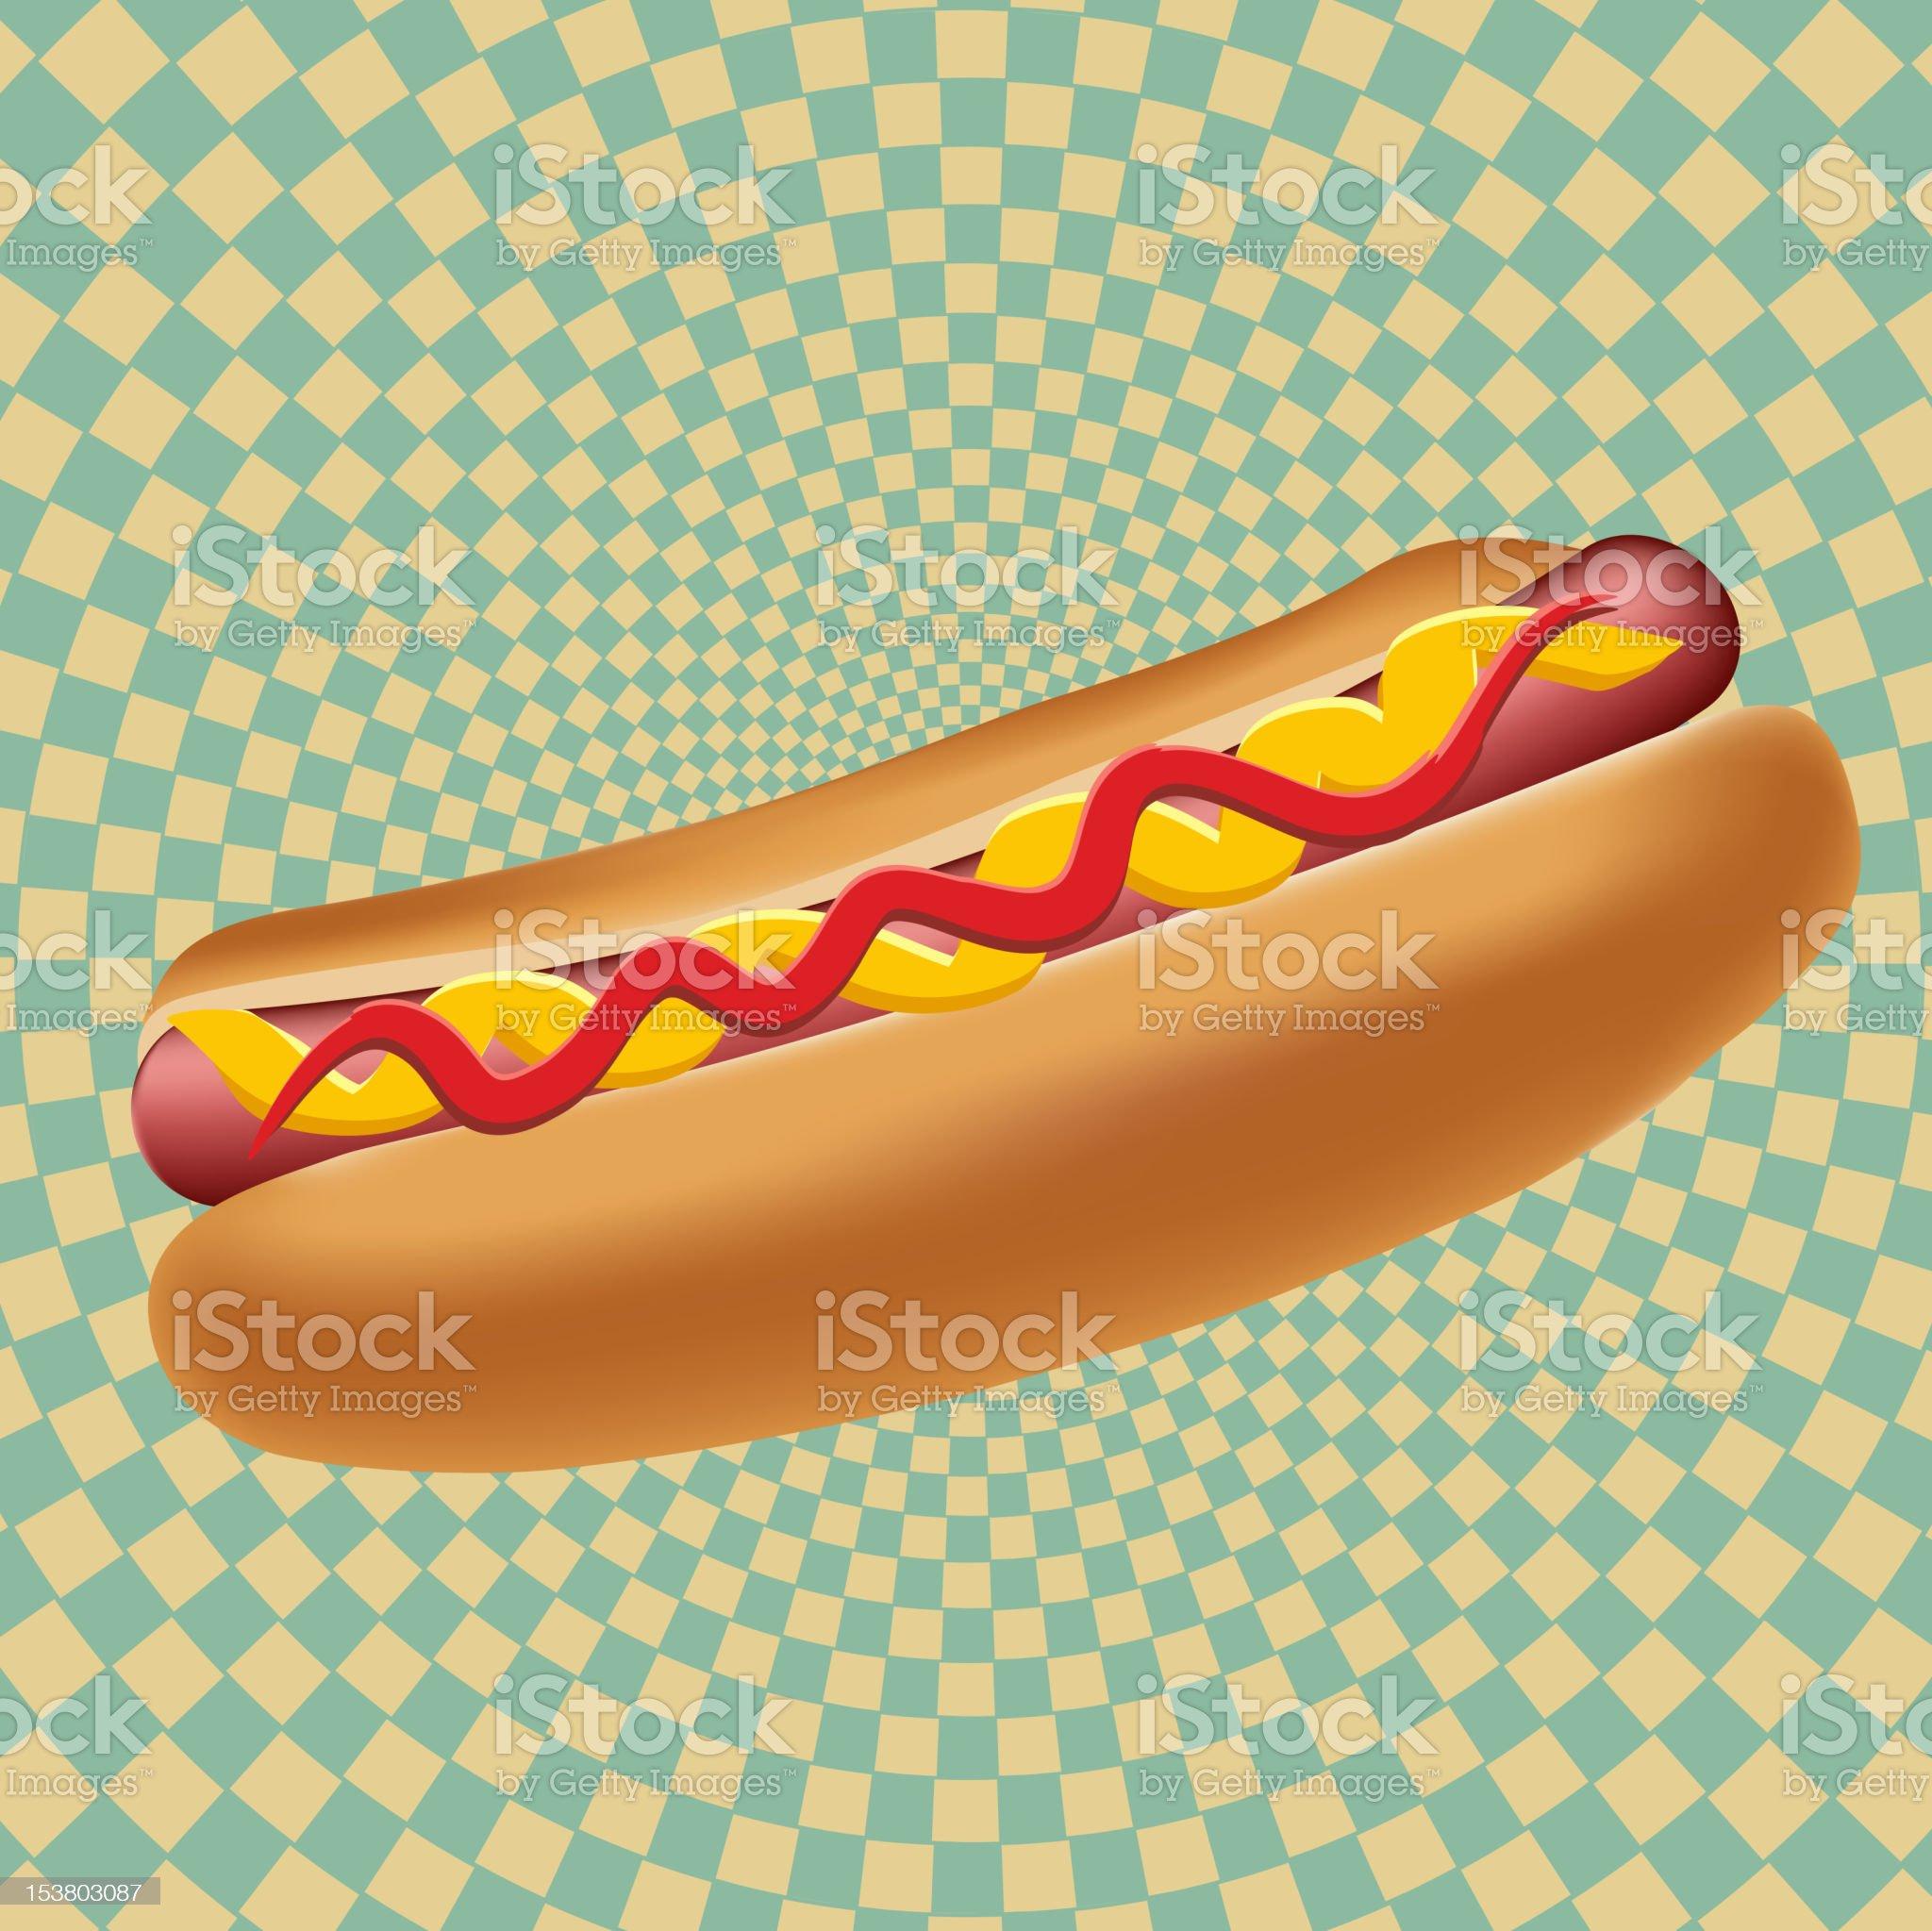 Realistic hot dog vector illustration royalty-free stock vector art